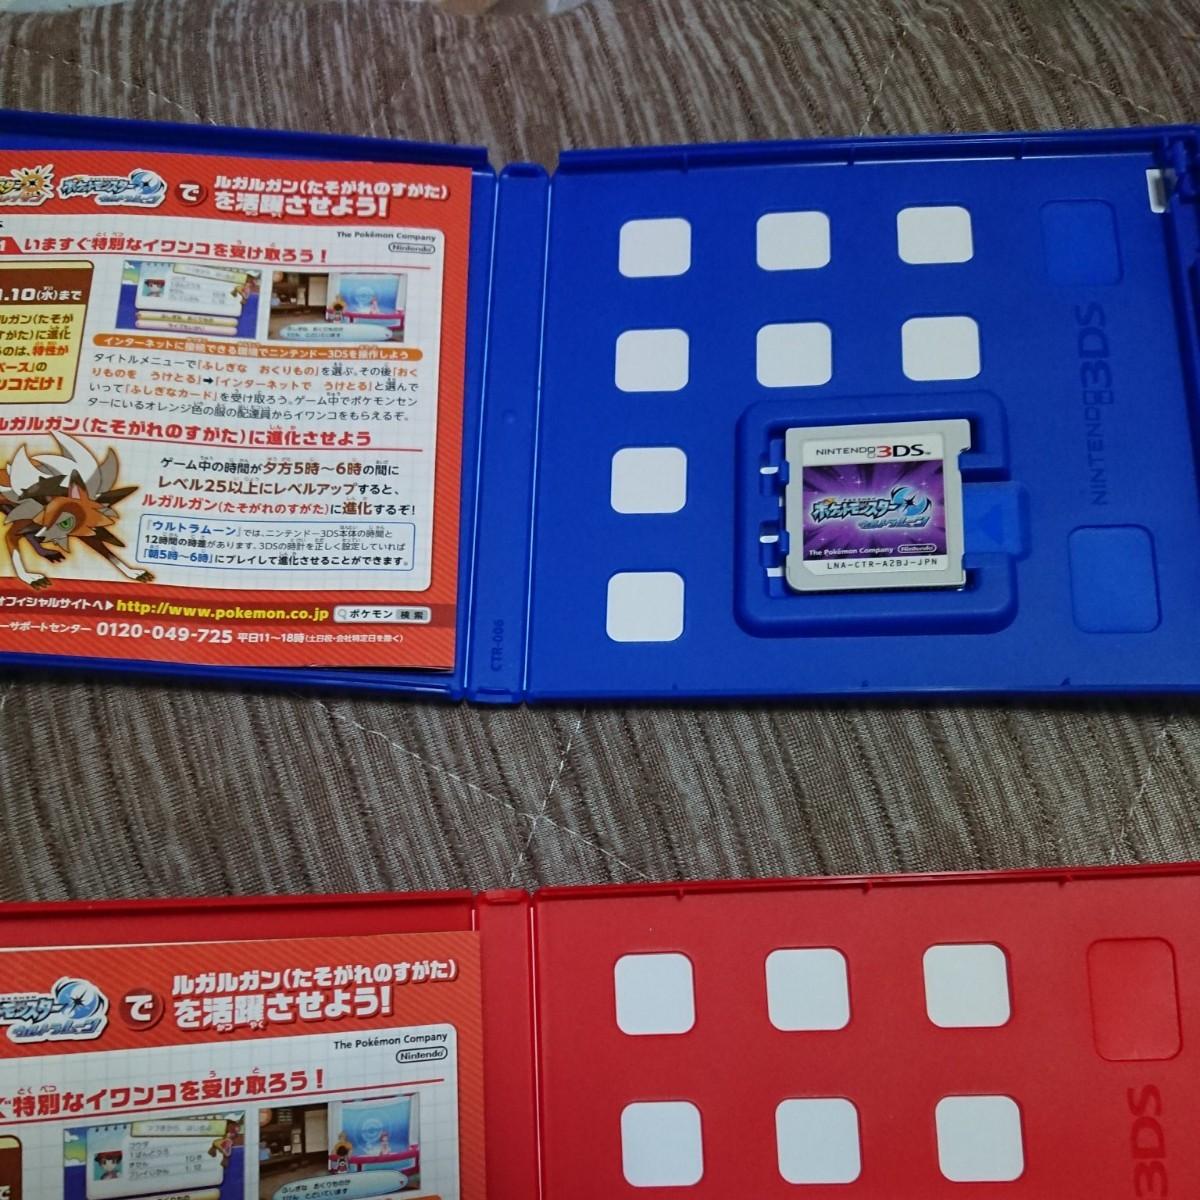 3DSソフト ポケットモンスターウルトラムーン ポケットモンスターウルトラサン